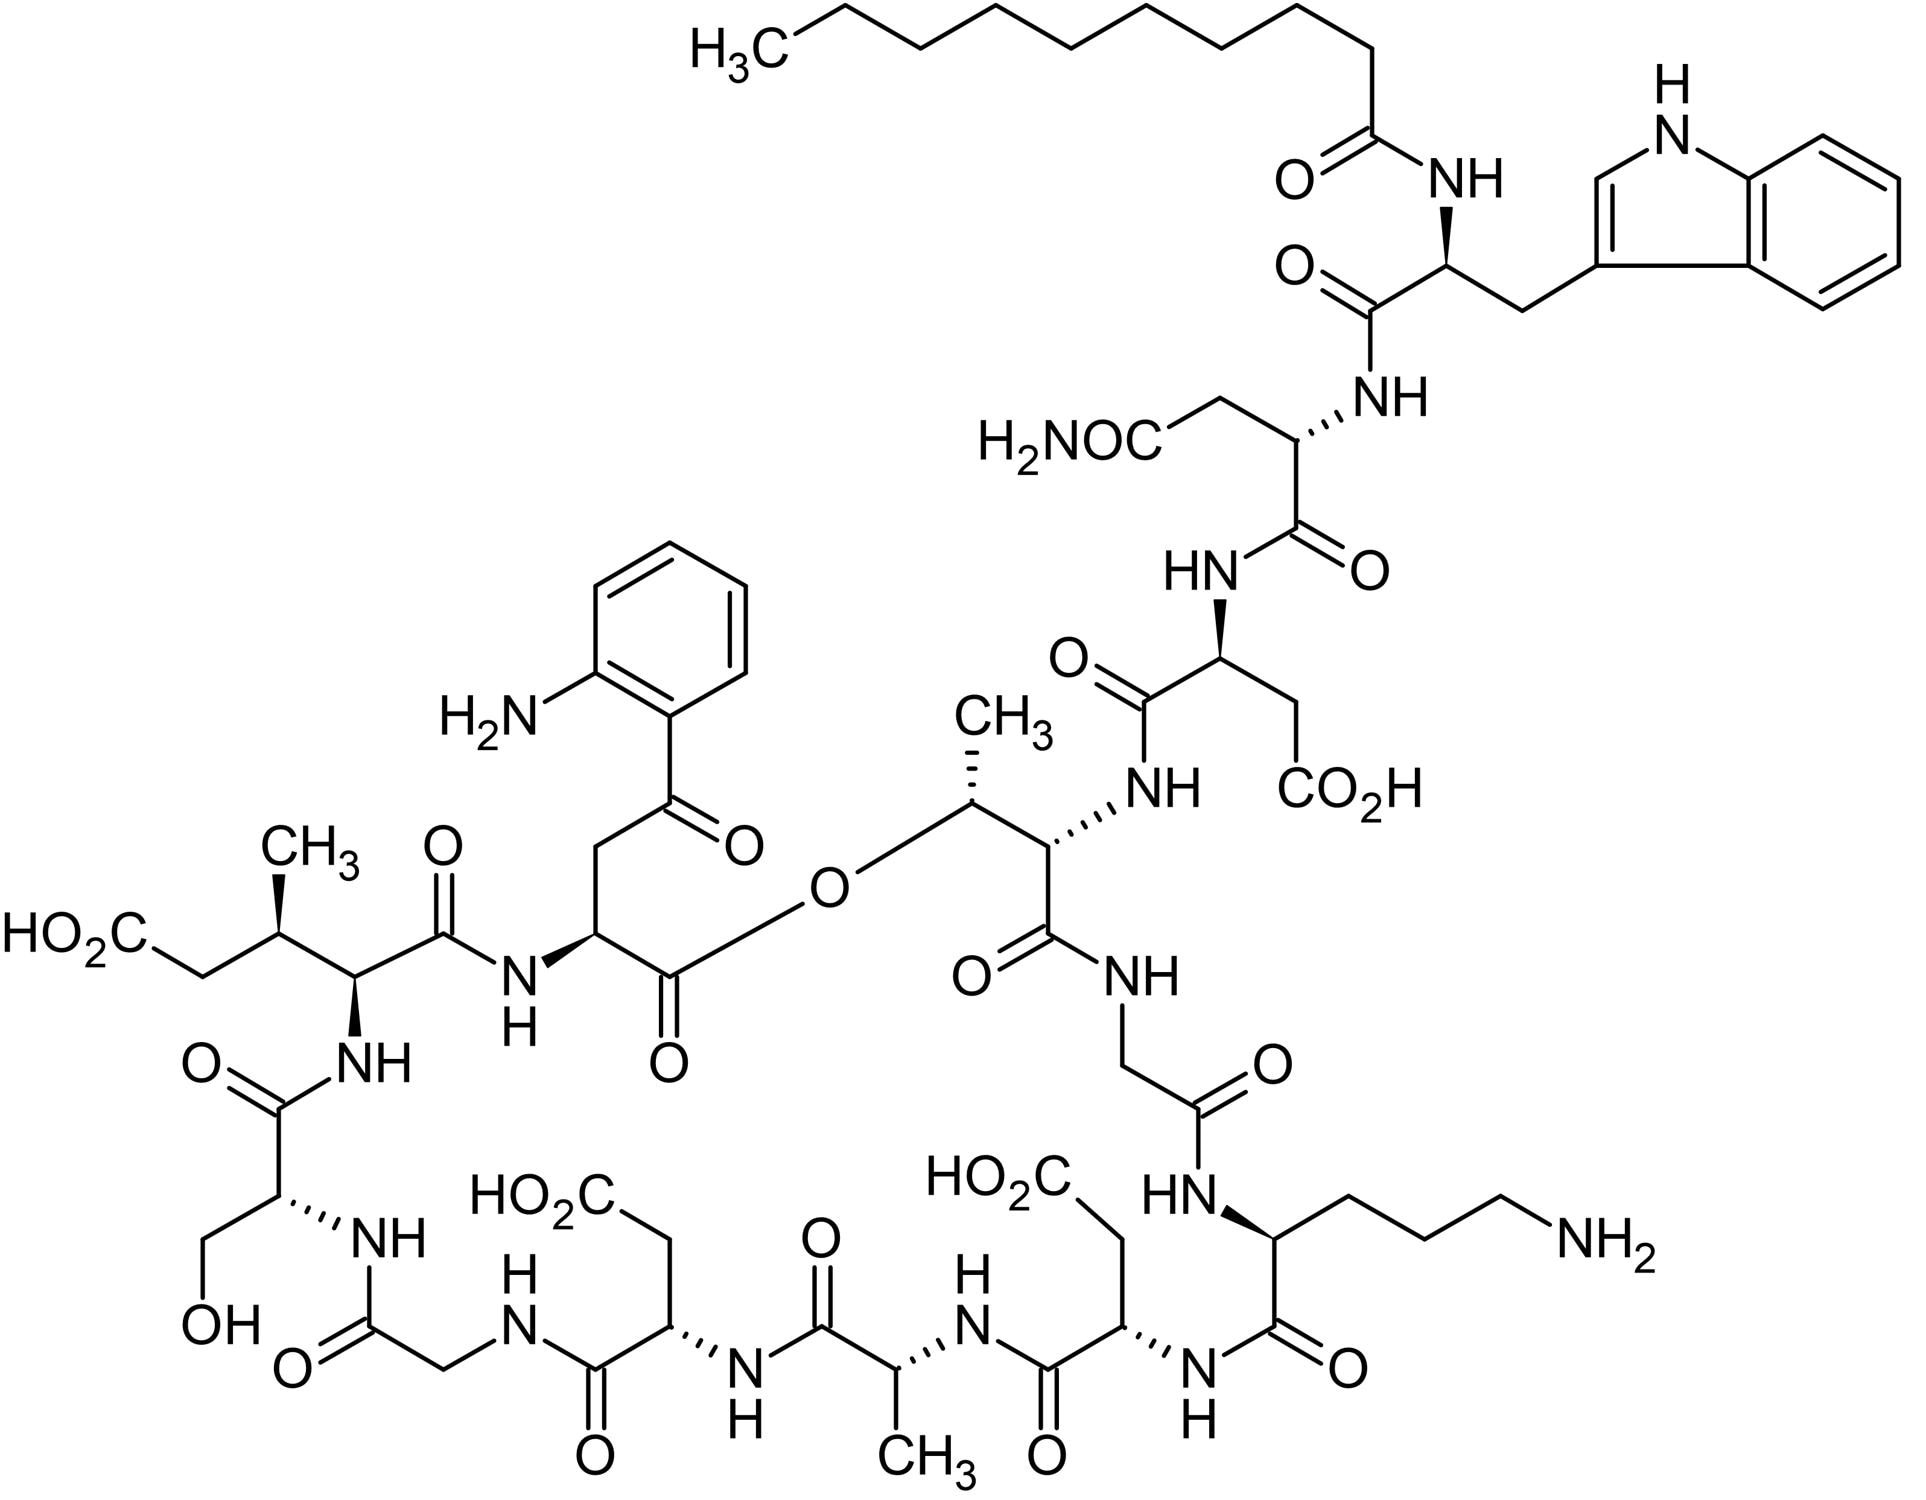 Chemical Structure - Daptomycin, Lipopeptide antibiotic (ab141204)